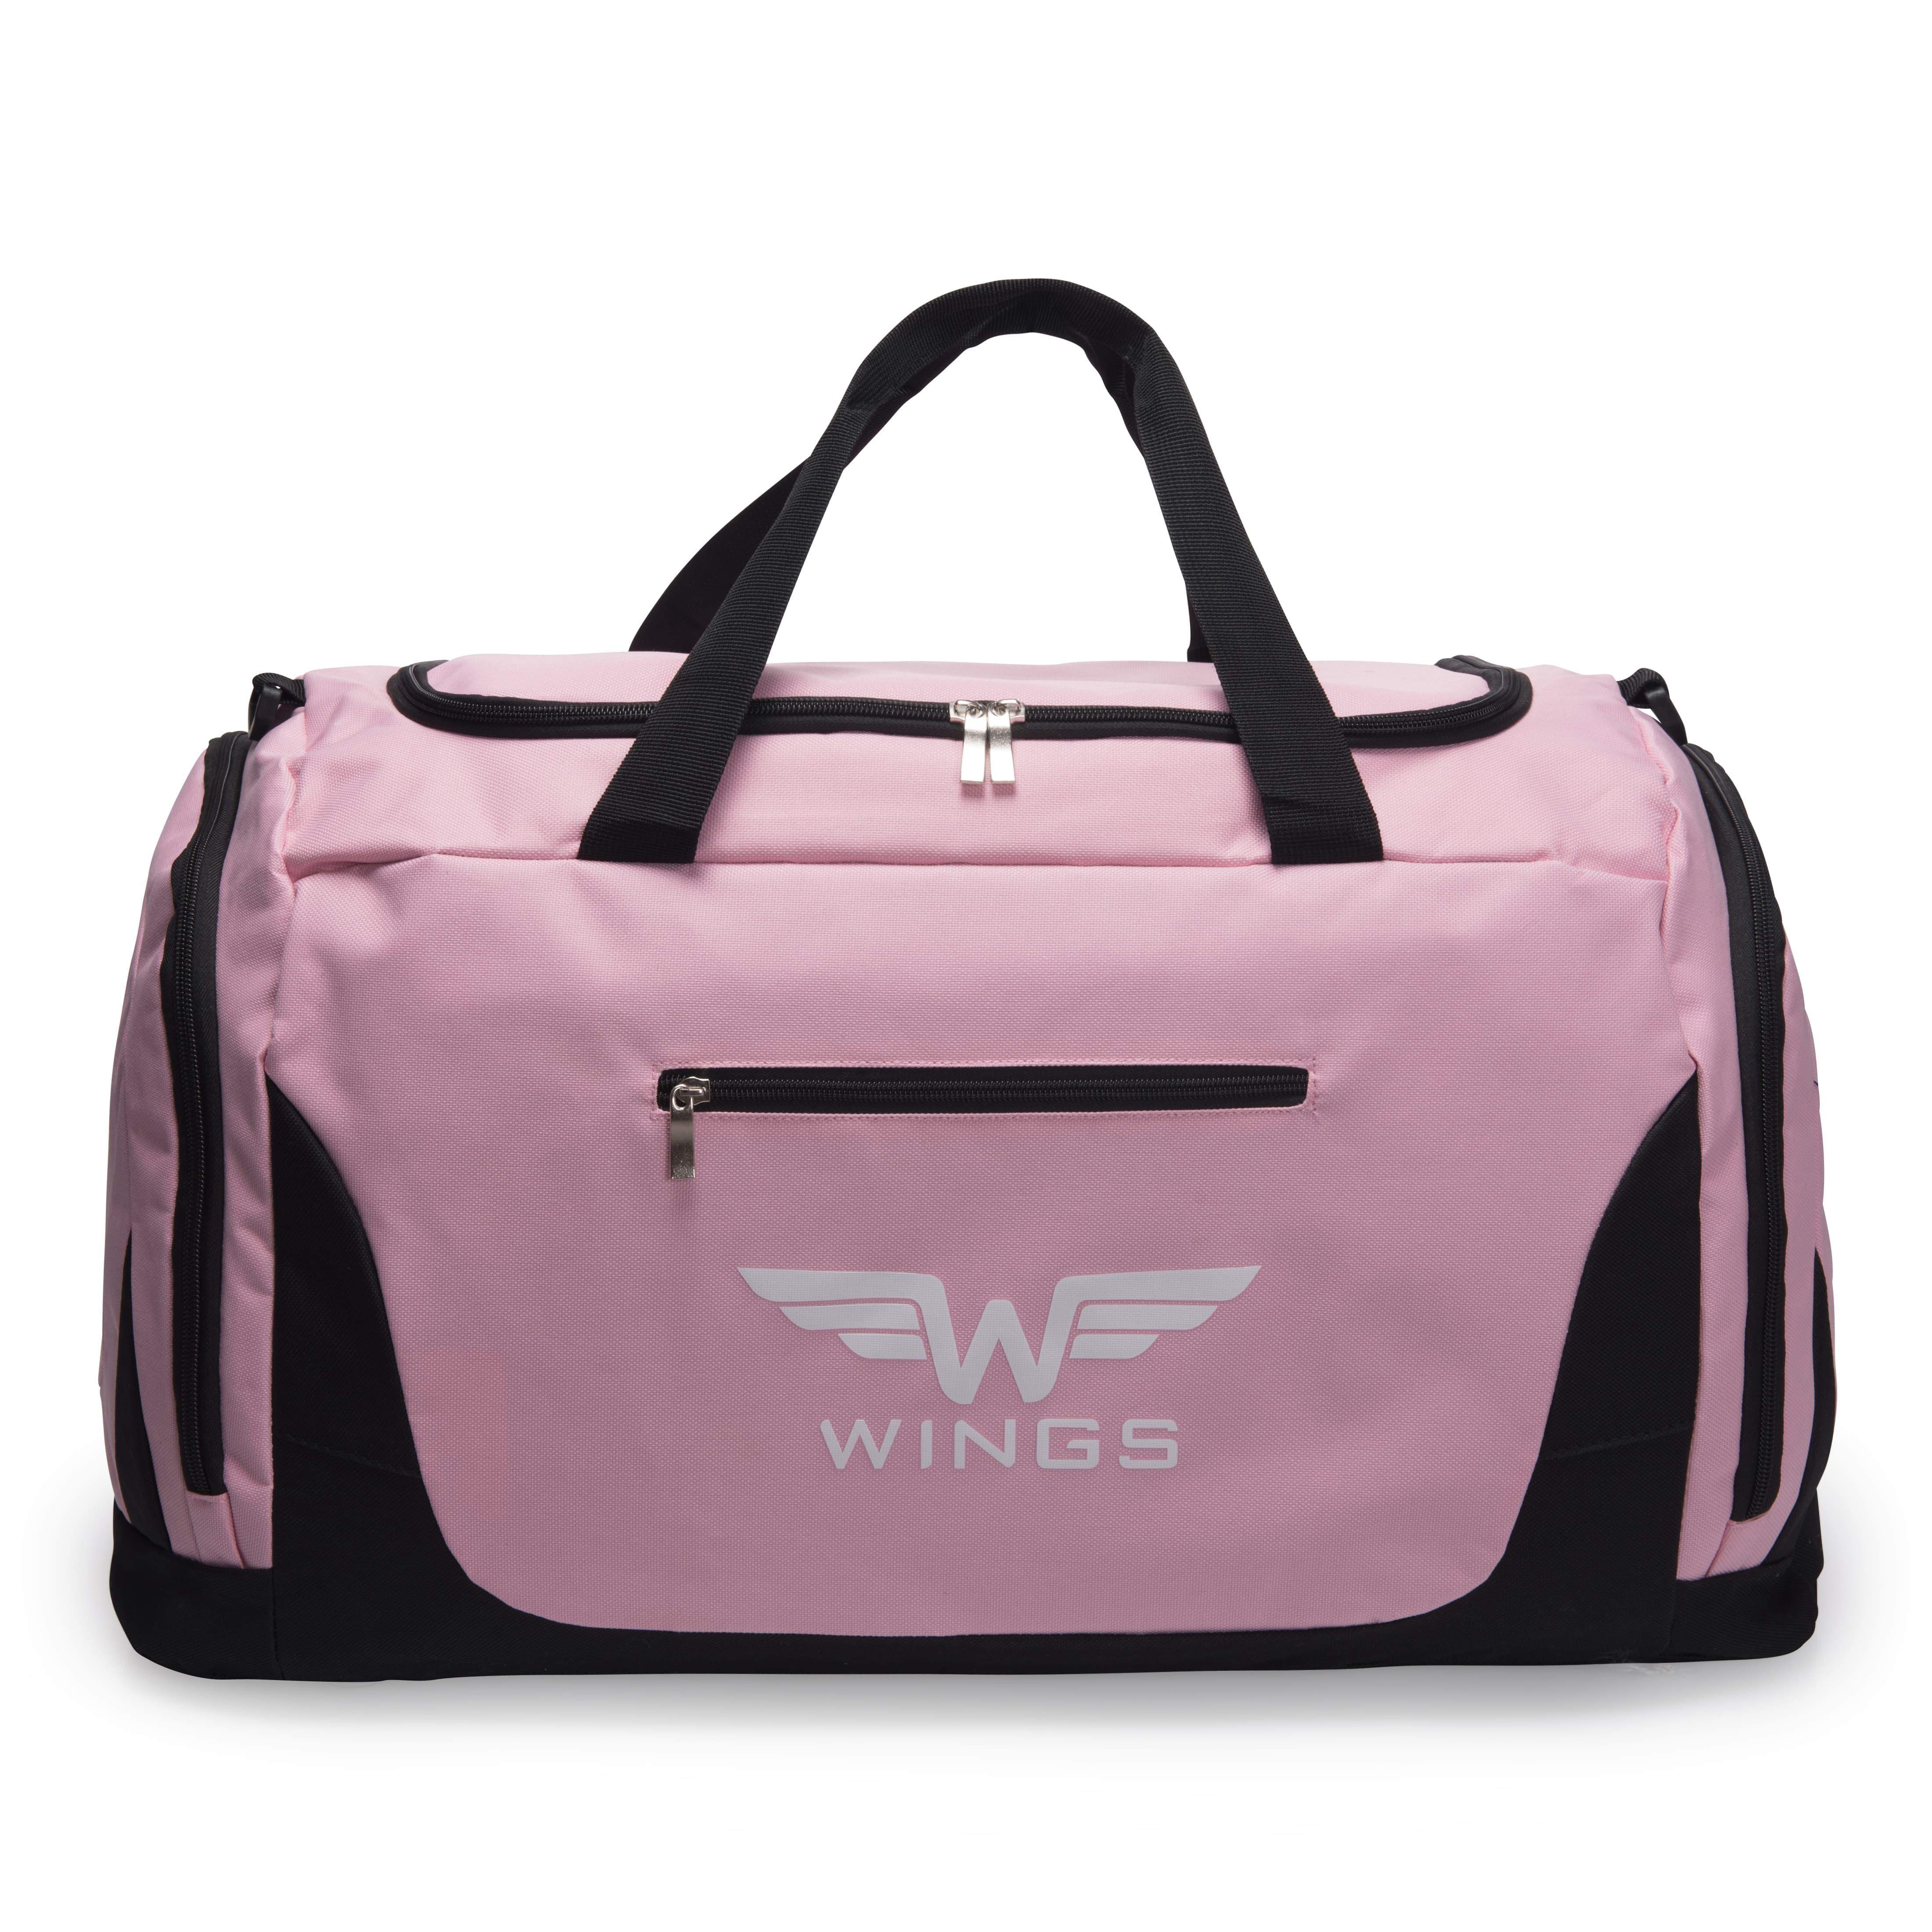 Дорожная сумка средная WINGS TB1005 M PINK